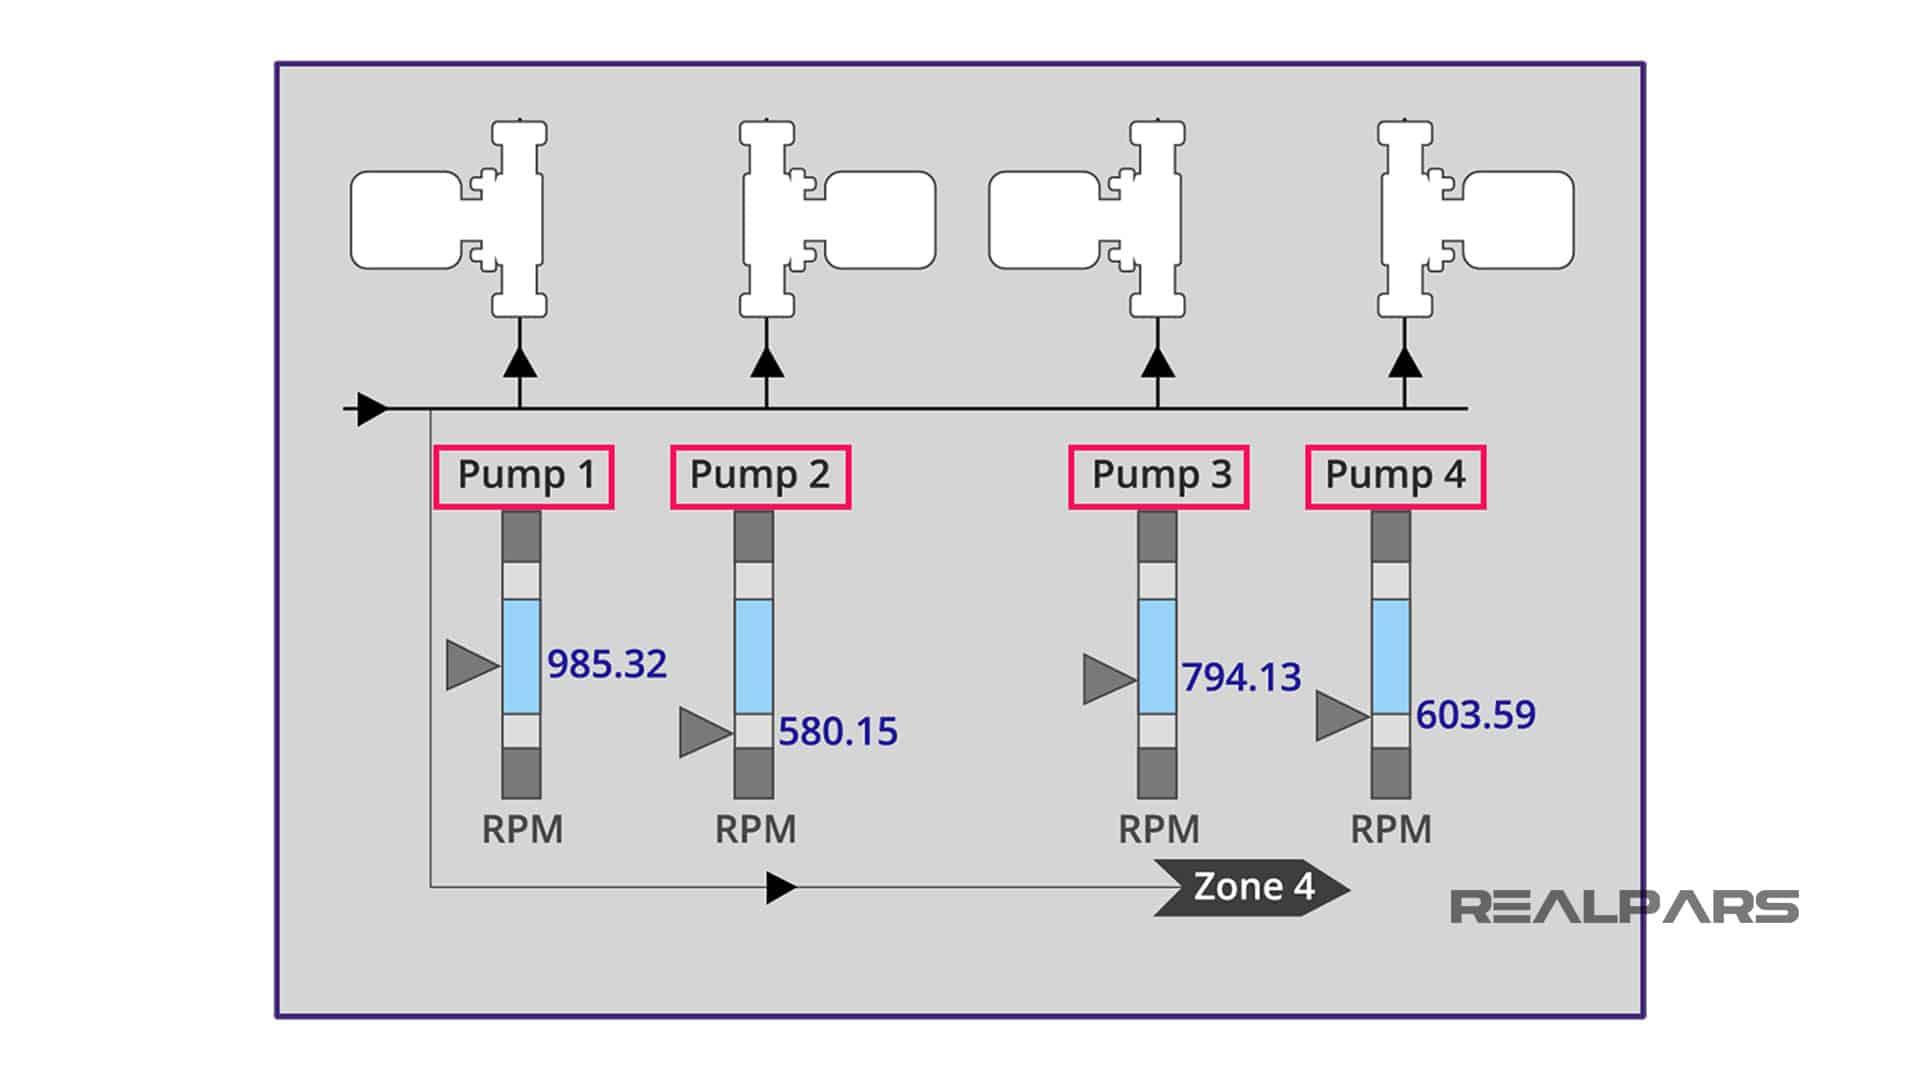 PLCnext Variables